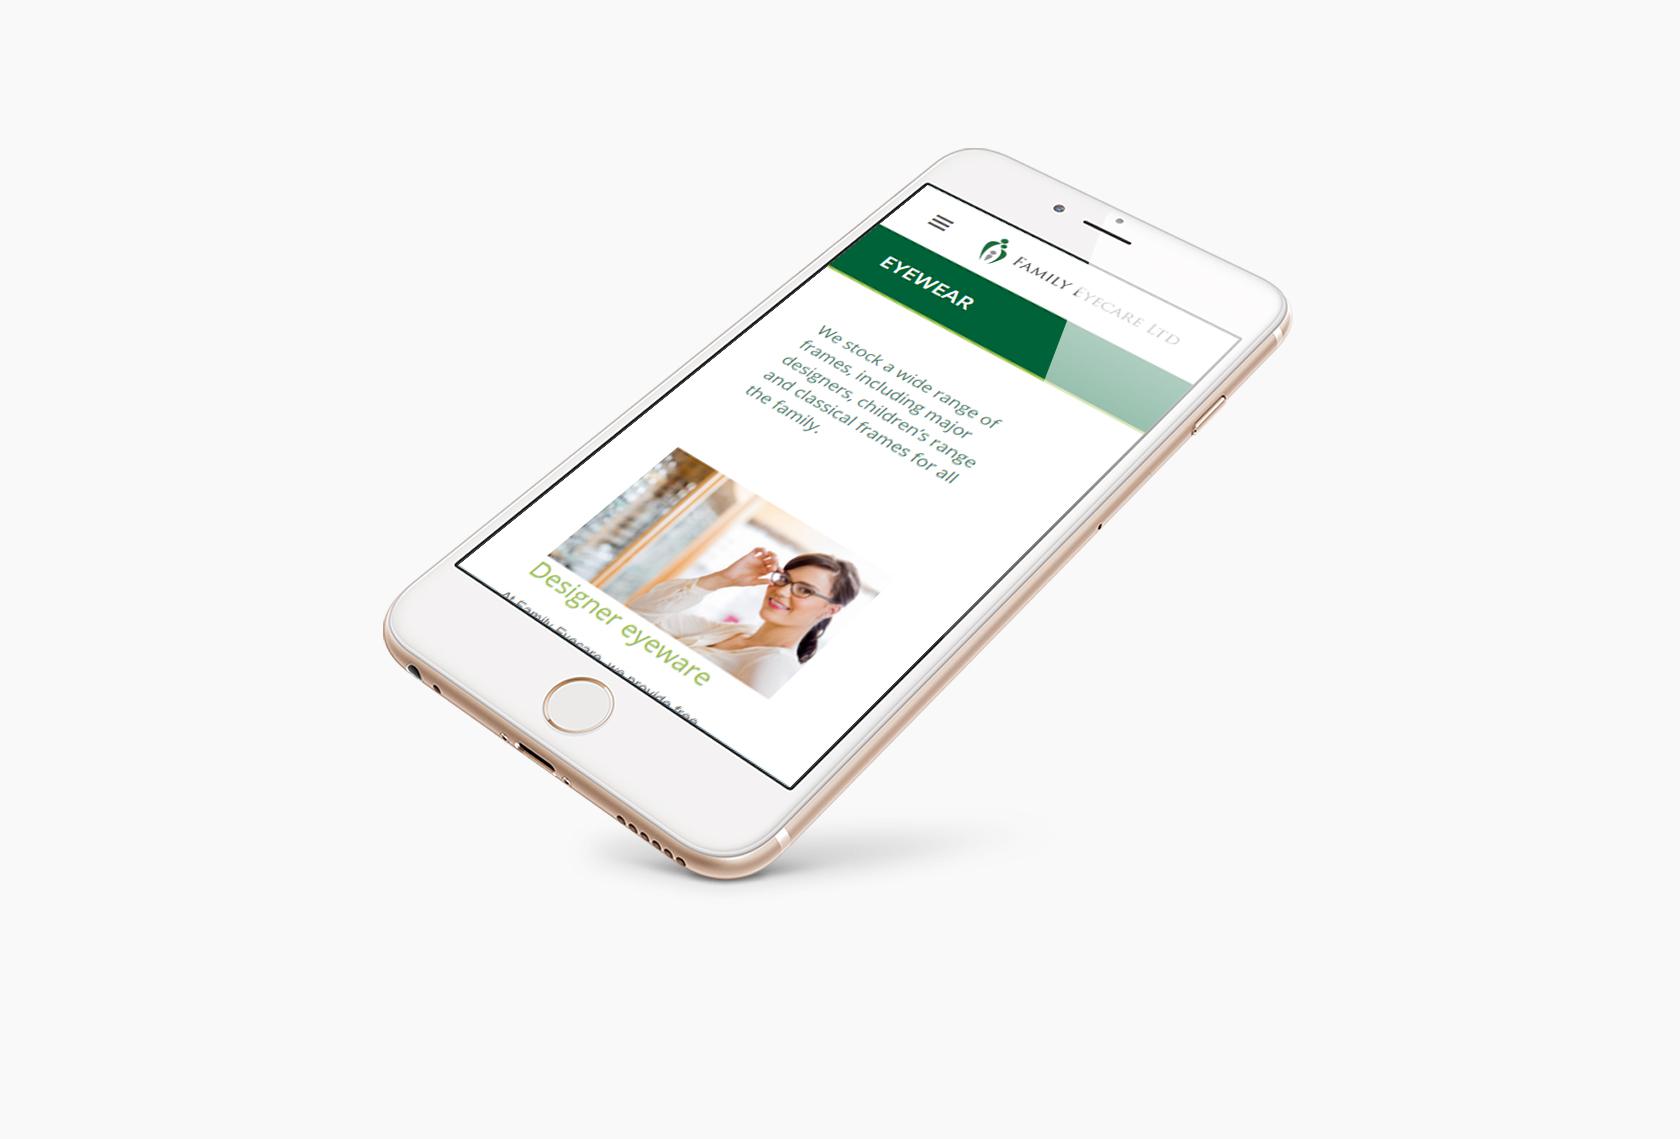 Family Eyecare Mobile - Family Eyecare - Creative Digital